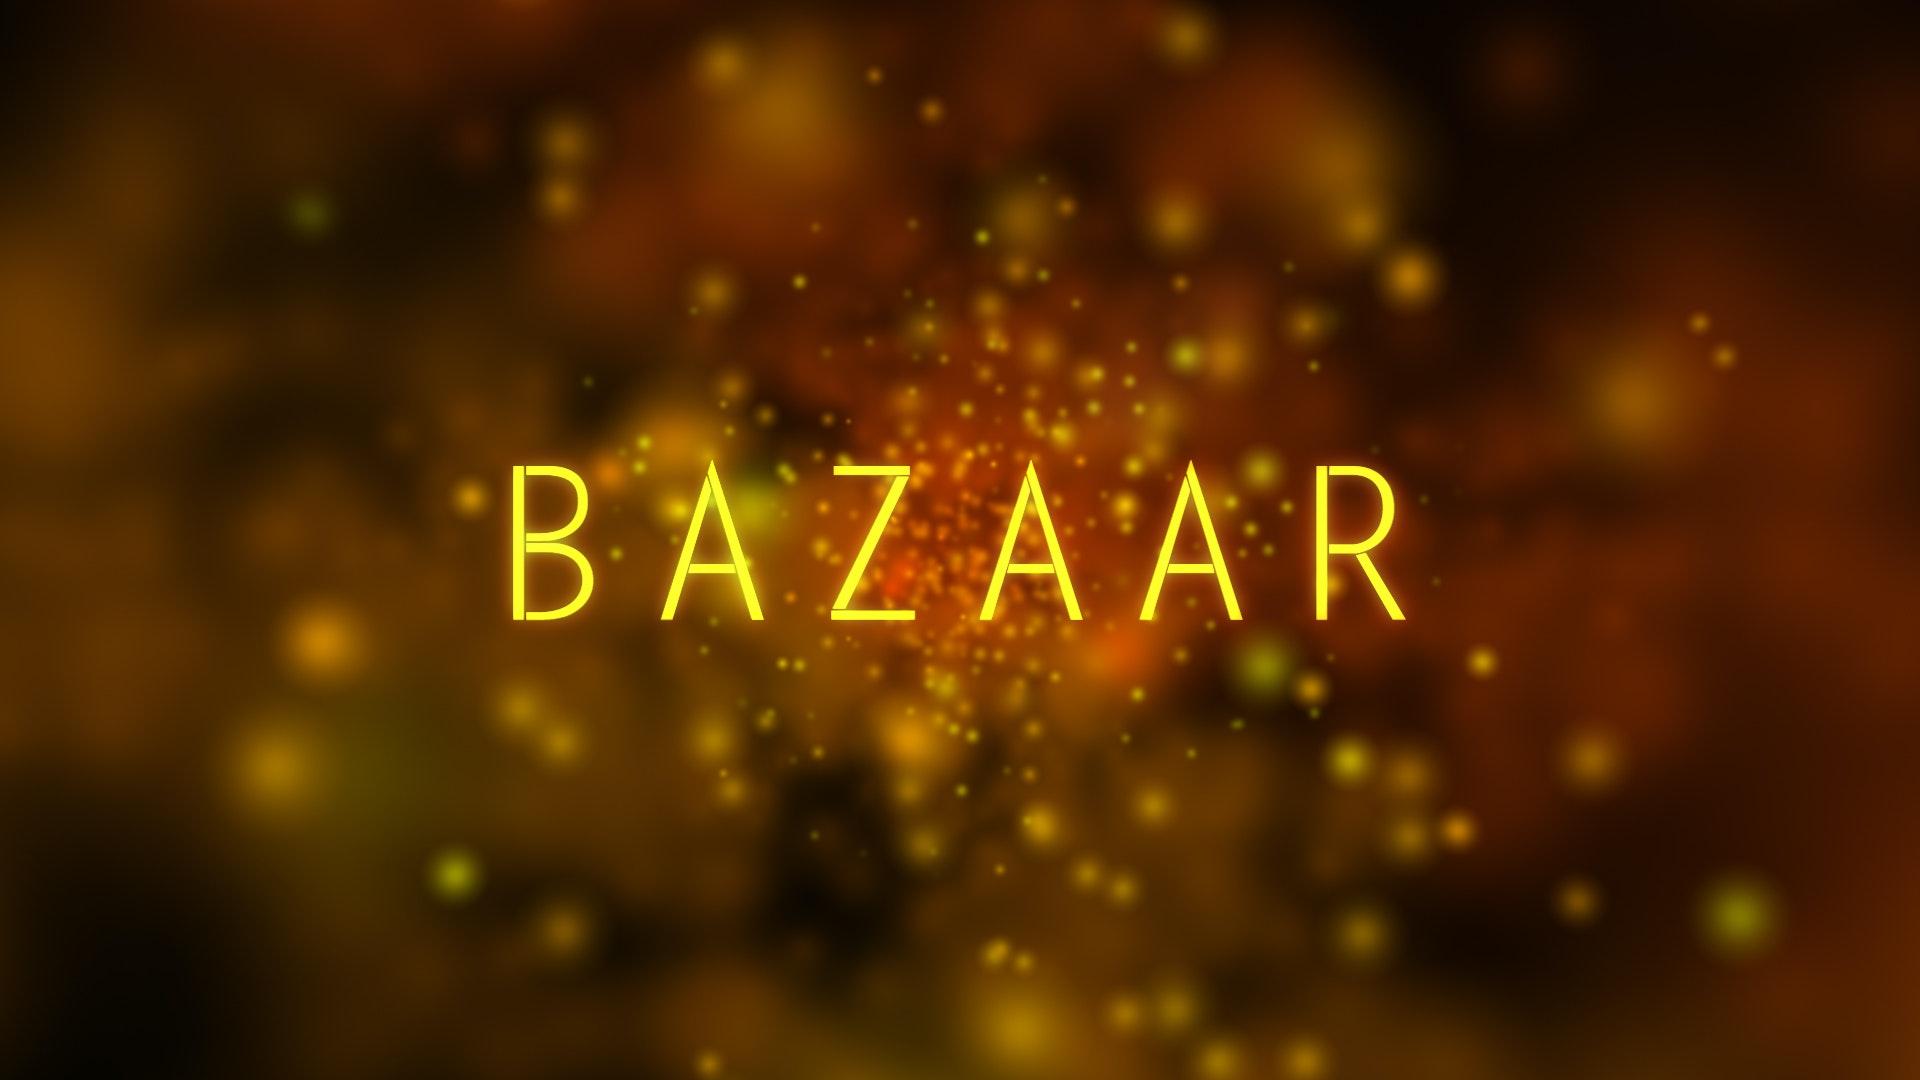 Bazaar Treasures of Latin America